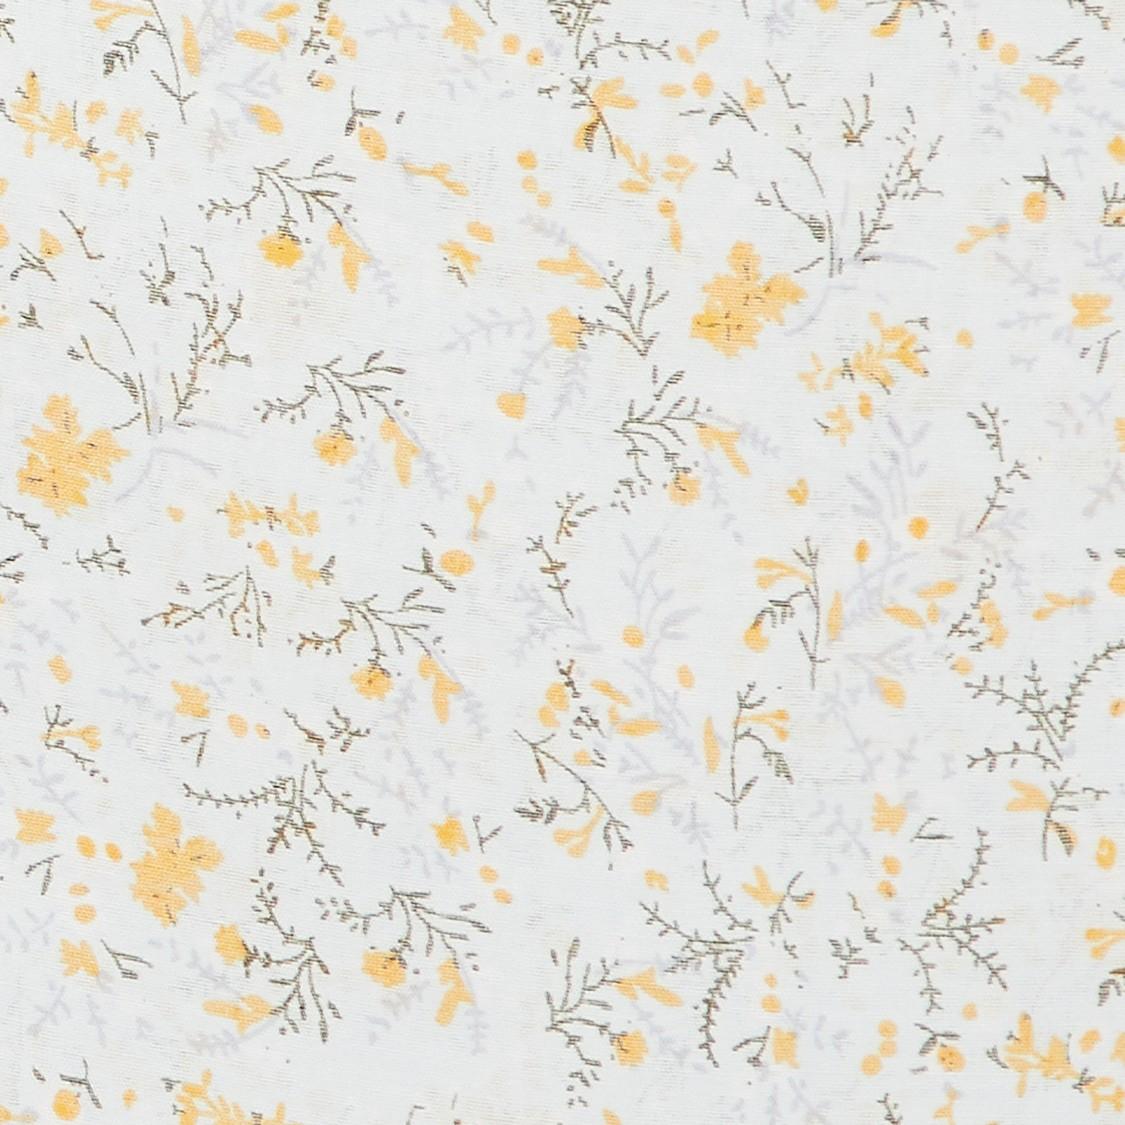 MAX Floral Print Scarf